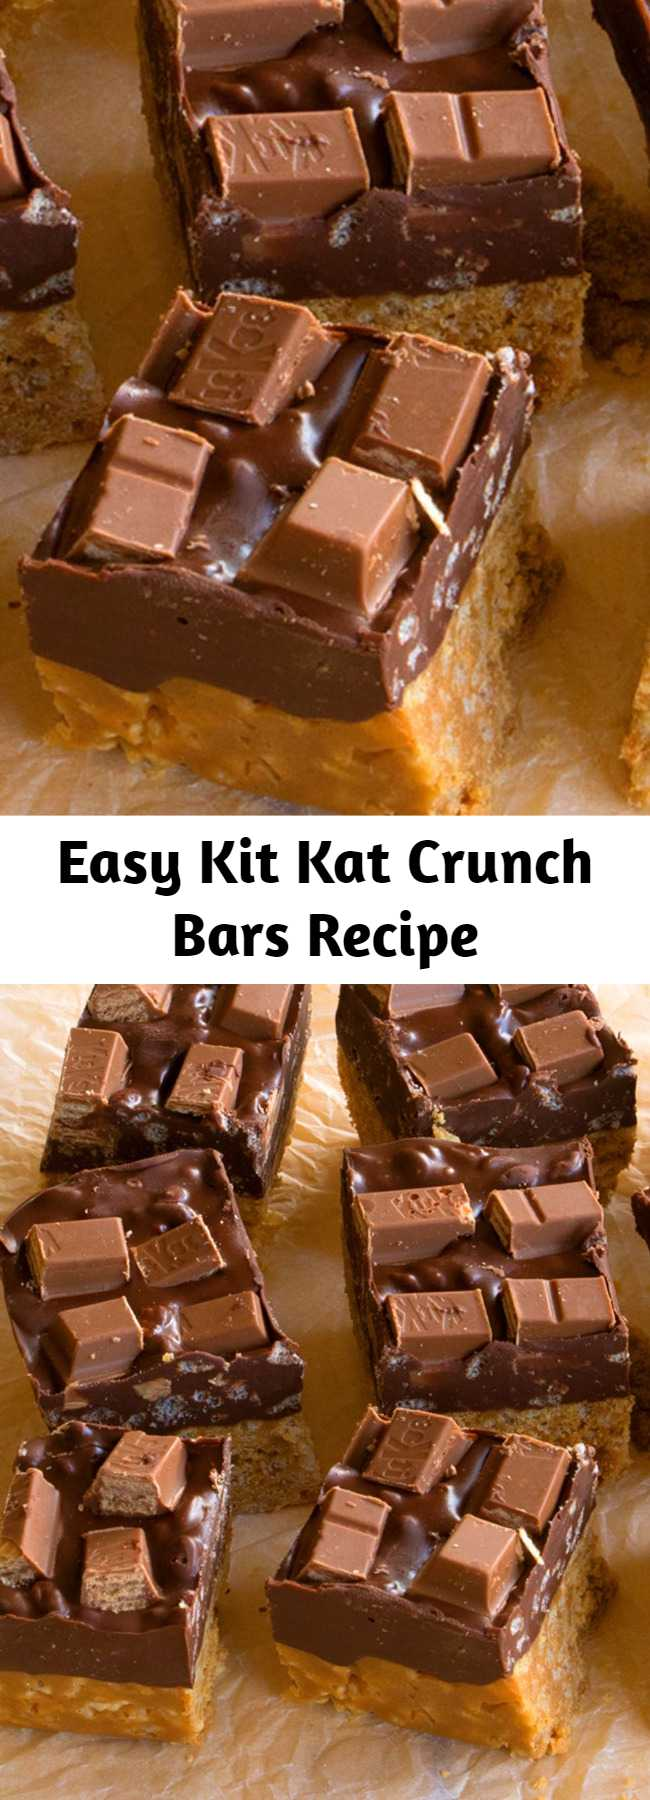 Easy Kit Kat Crunch Bars Recipe - Kit Kat lovers, we're lookin' at you!